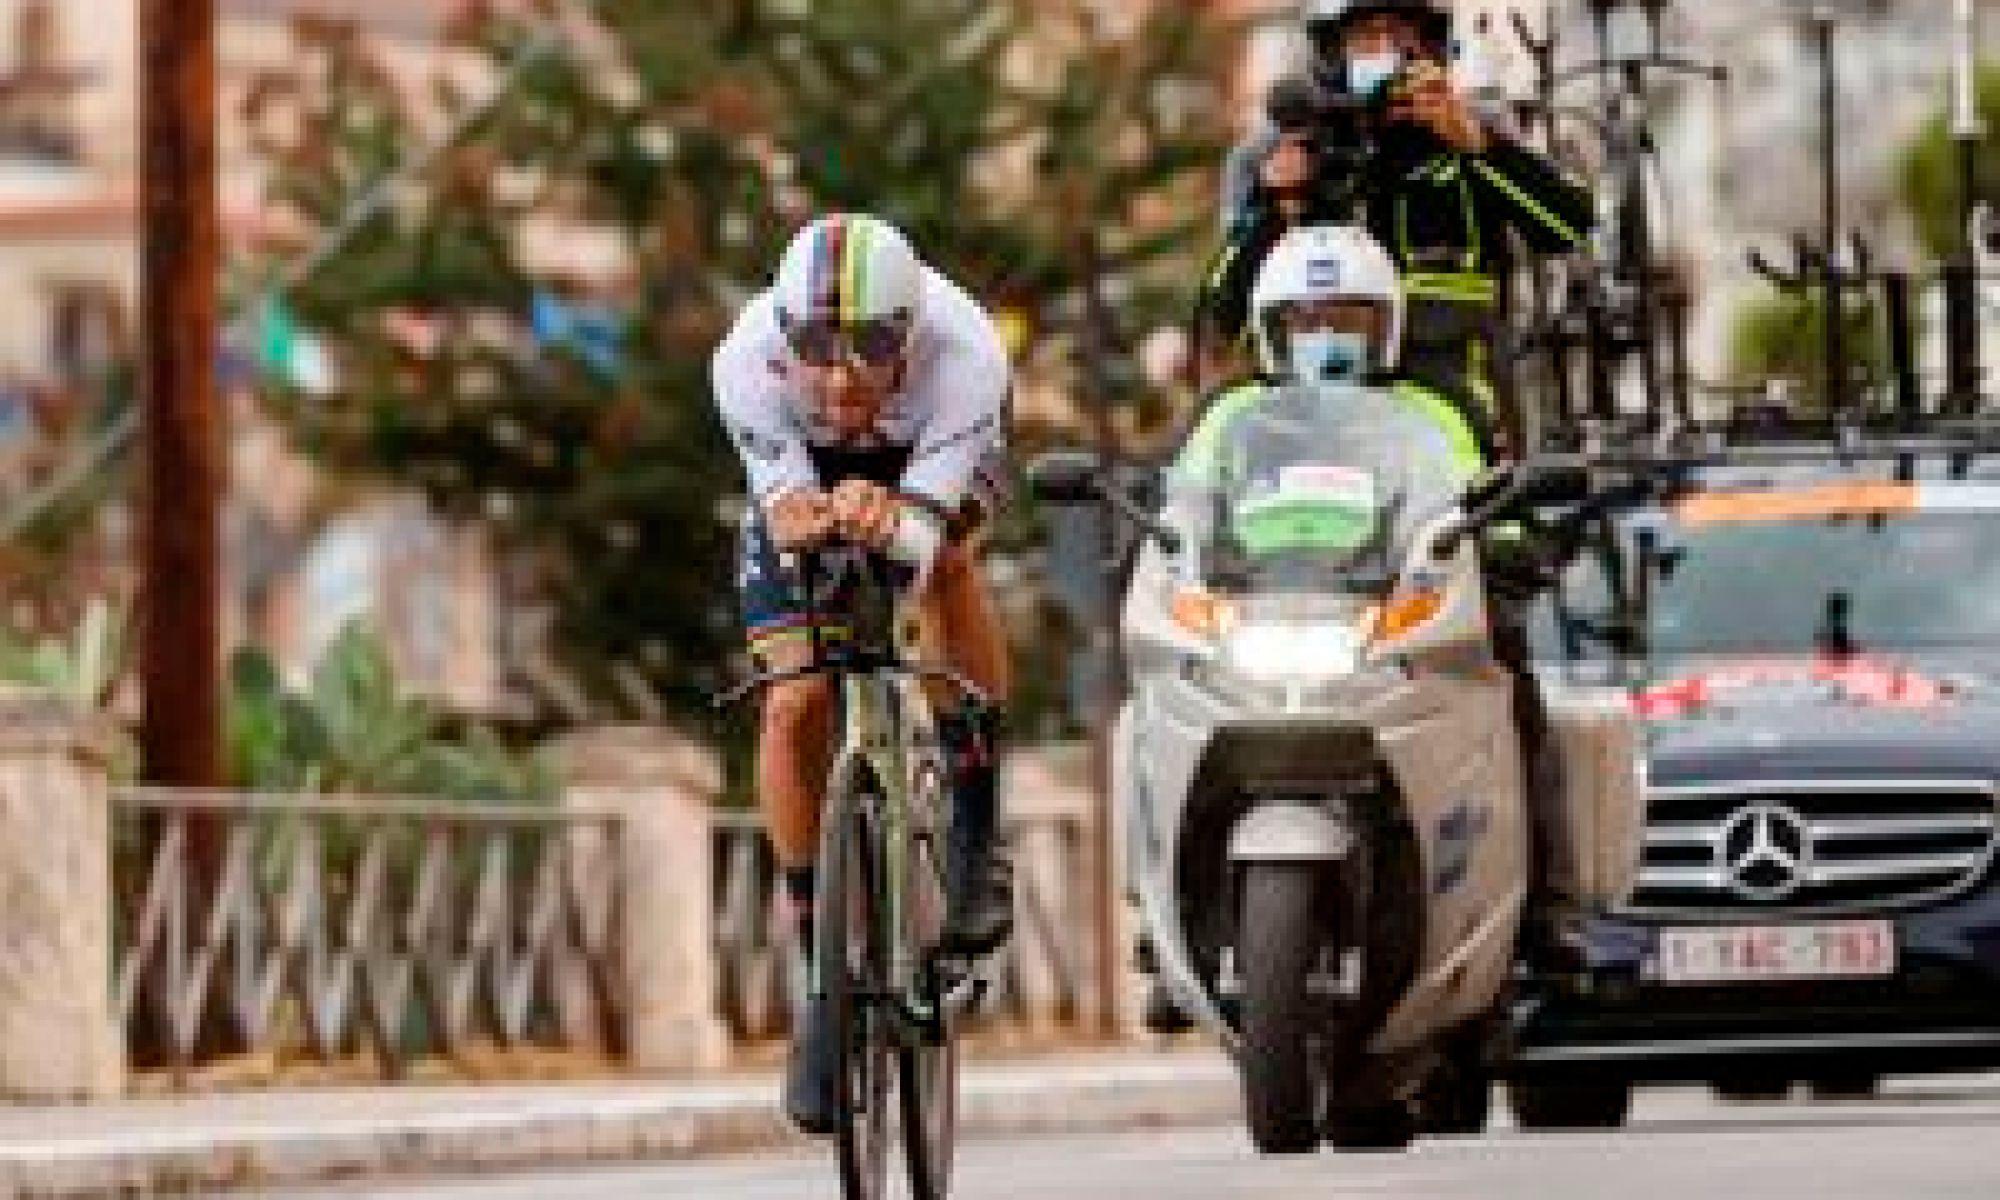 Giro d'Italia stage 14 time trial start times